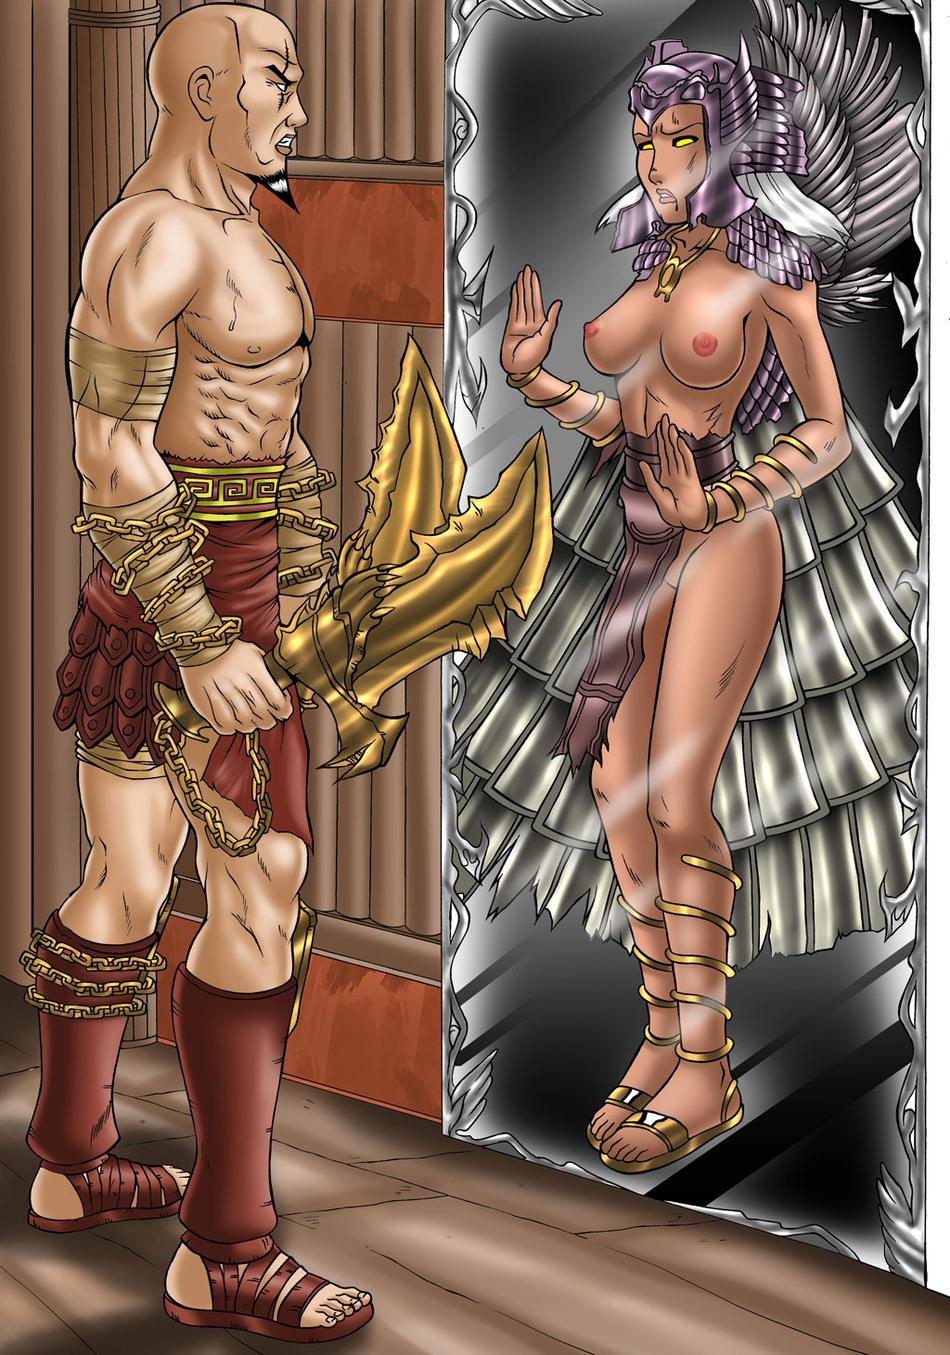 god of hentai war freya Dnd 3.5 book of erotic fantasy